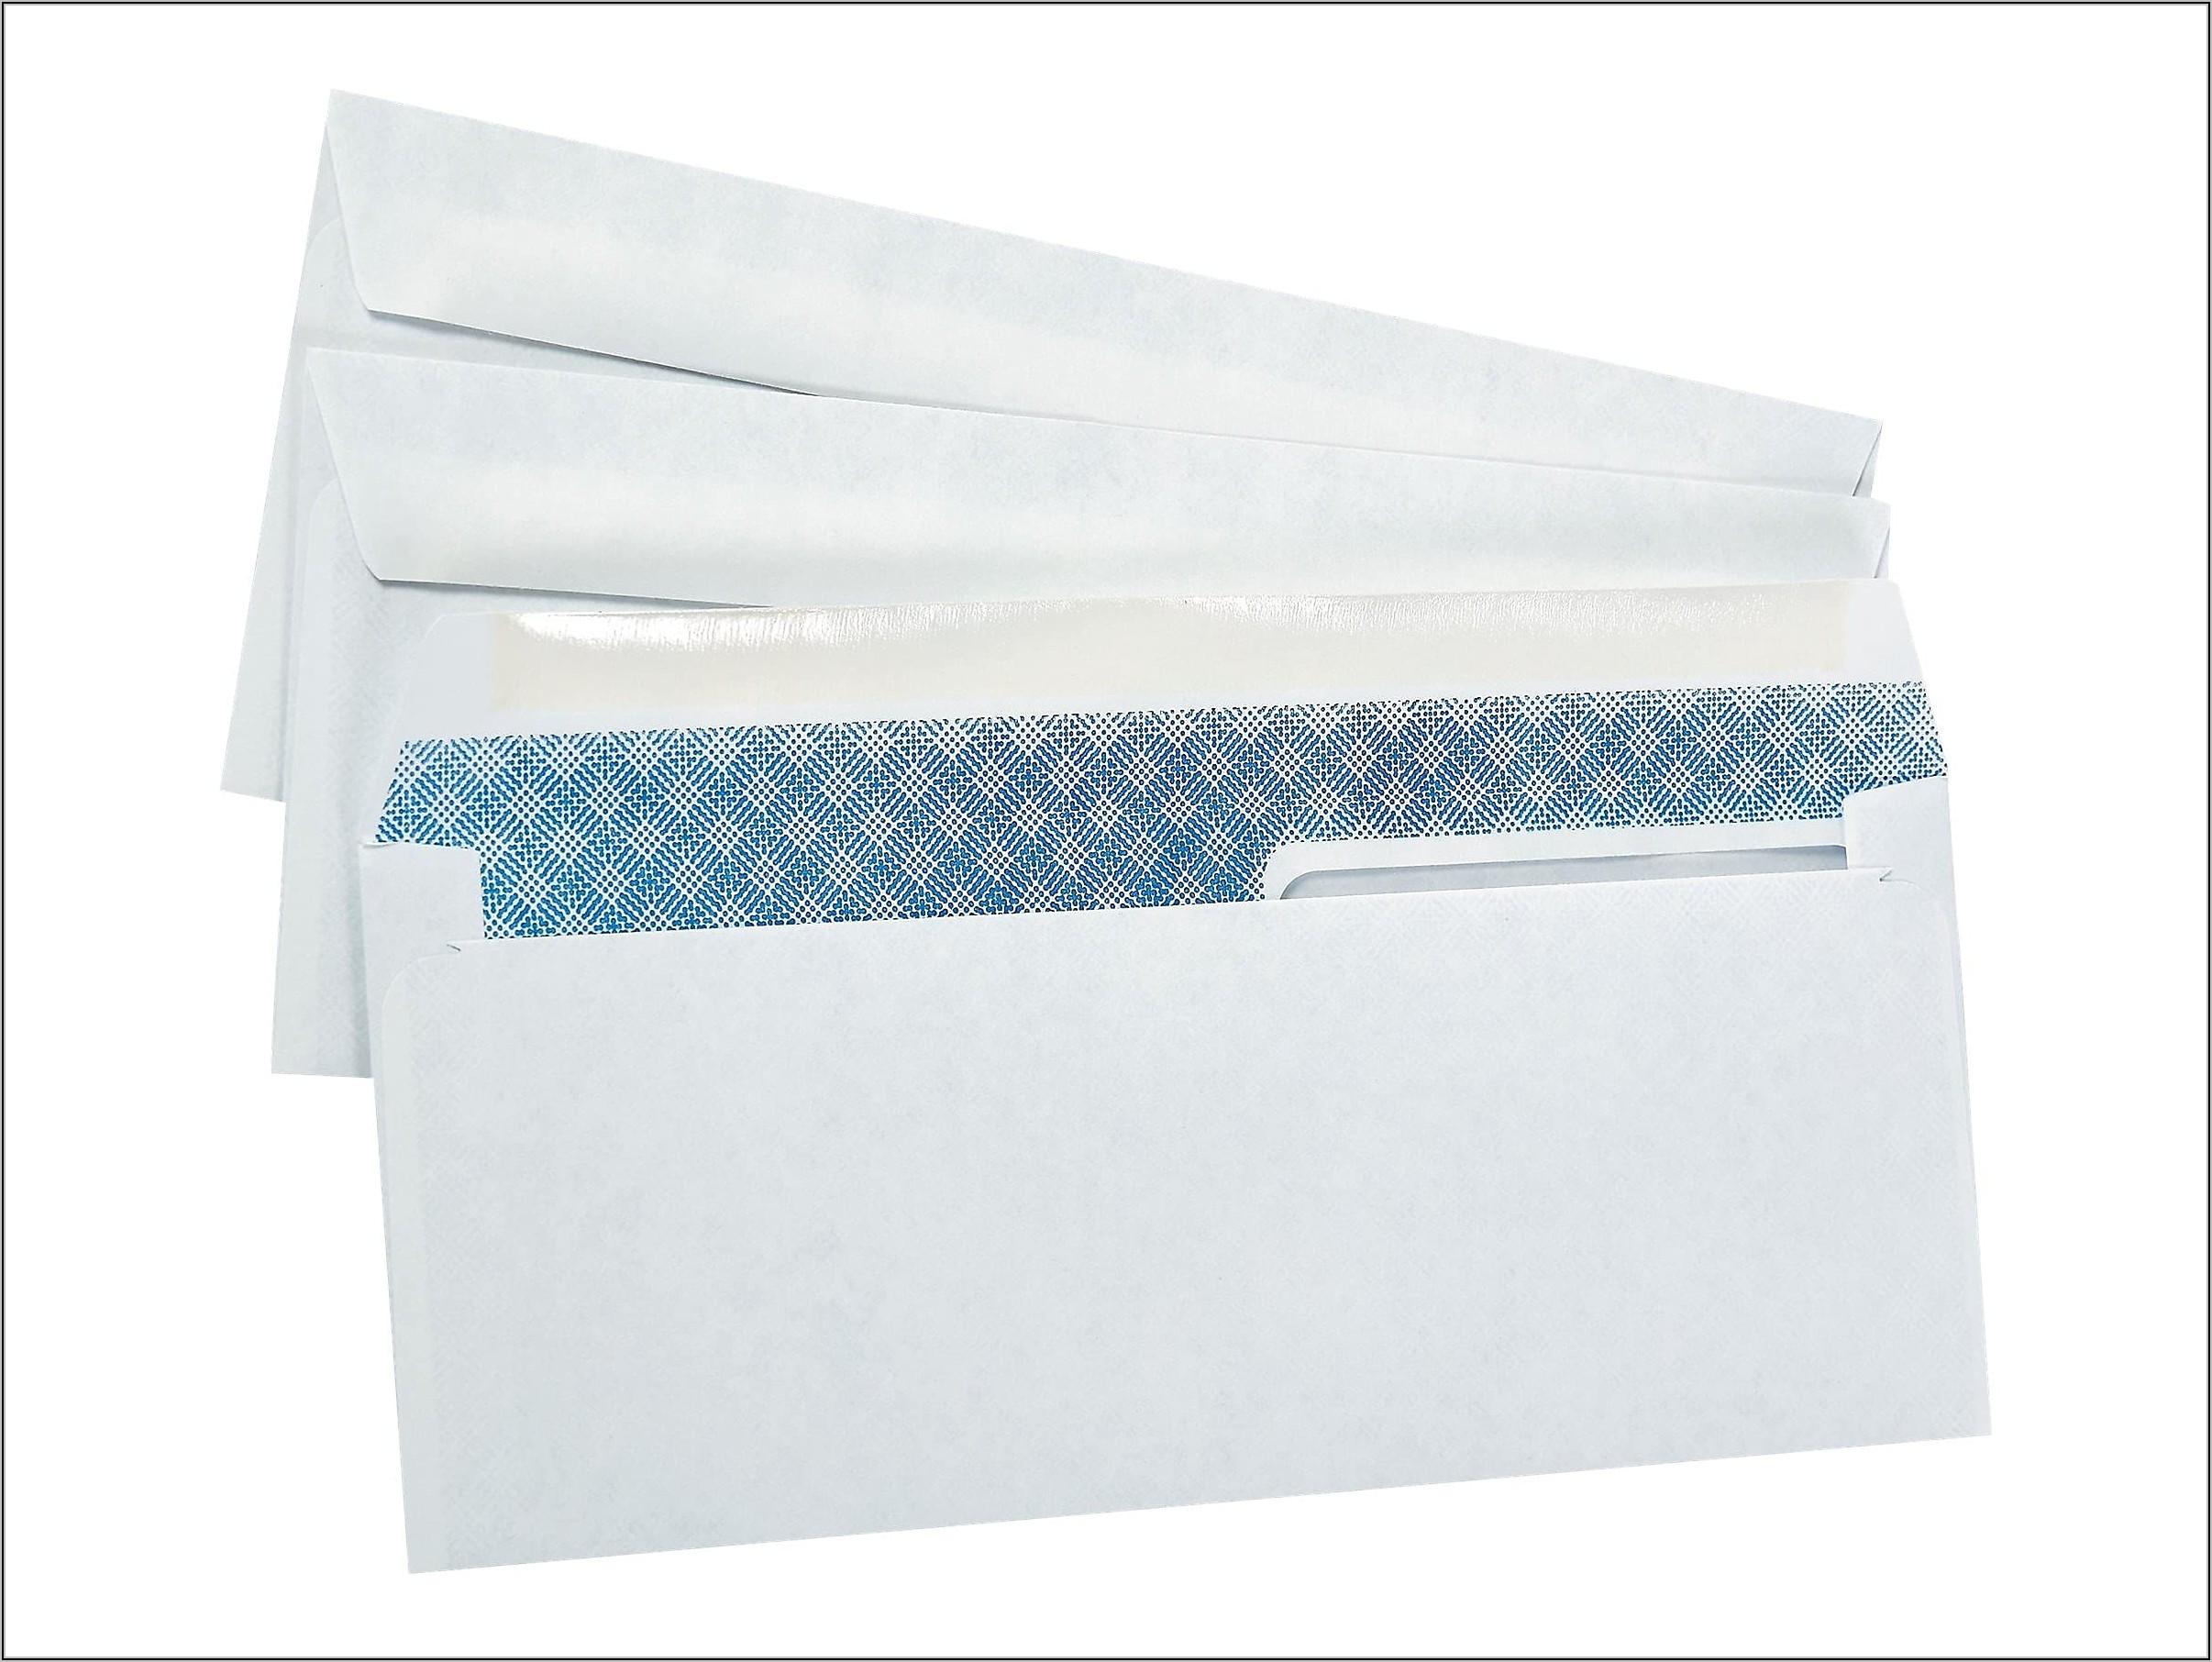 Staples Window Envelopes #10